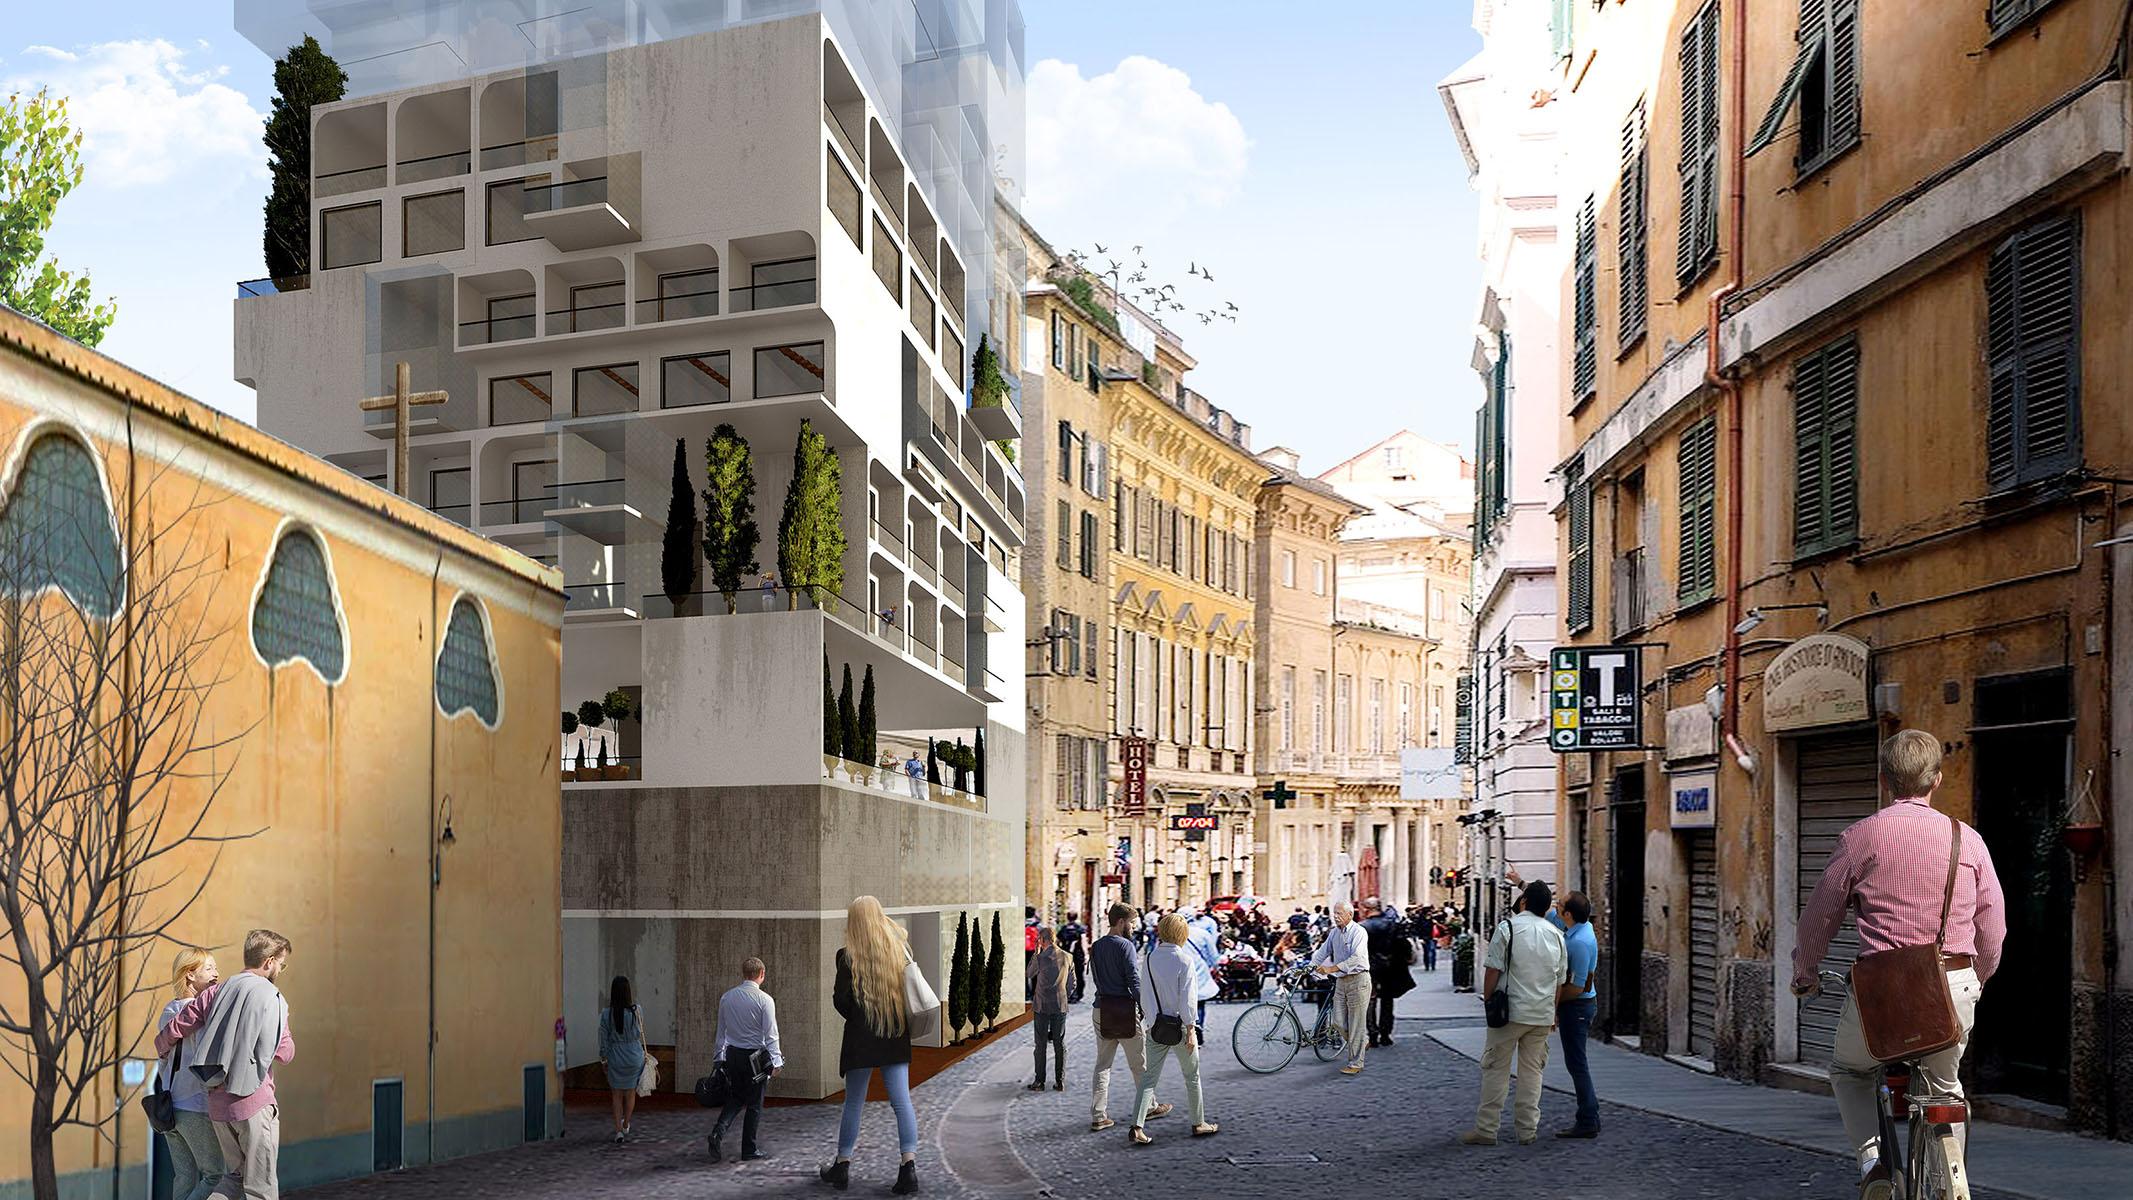 Genoa - A G Tehrani Design Studio - 01 - Section